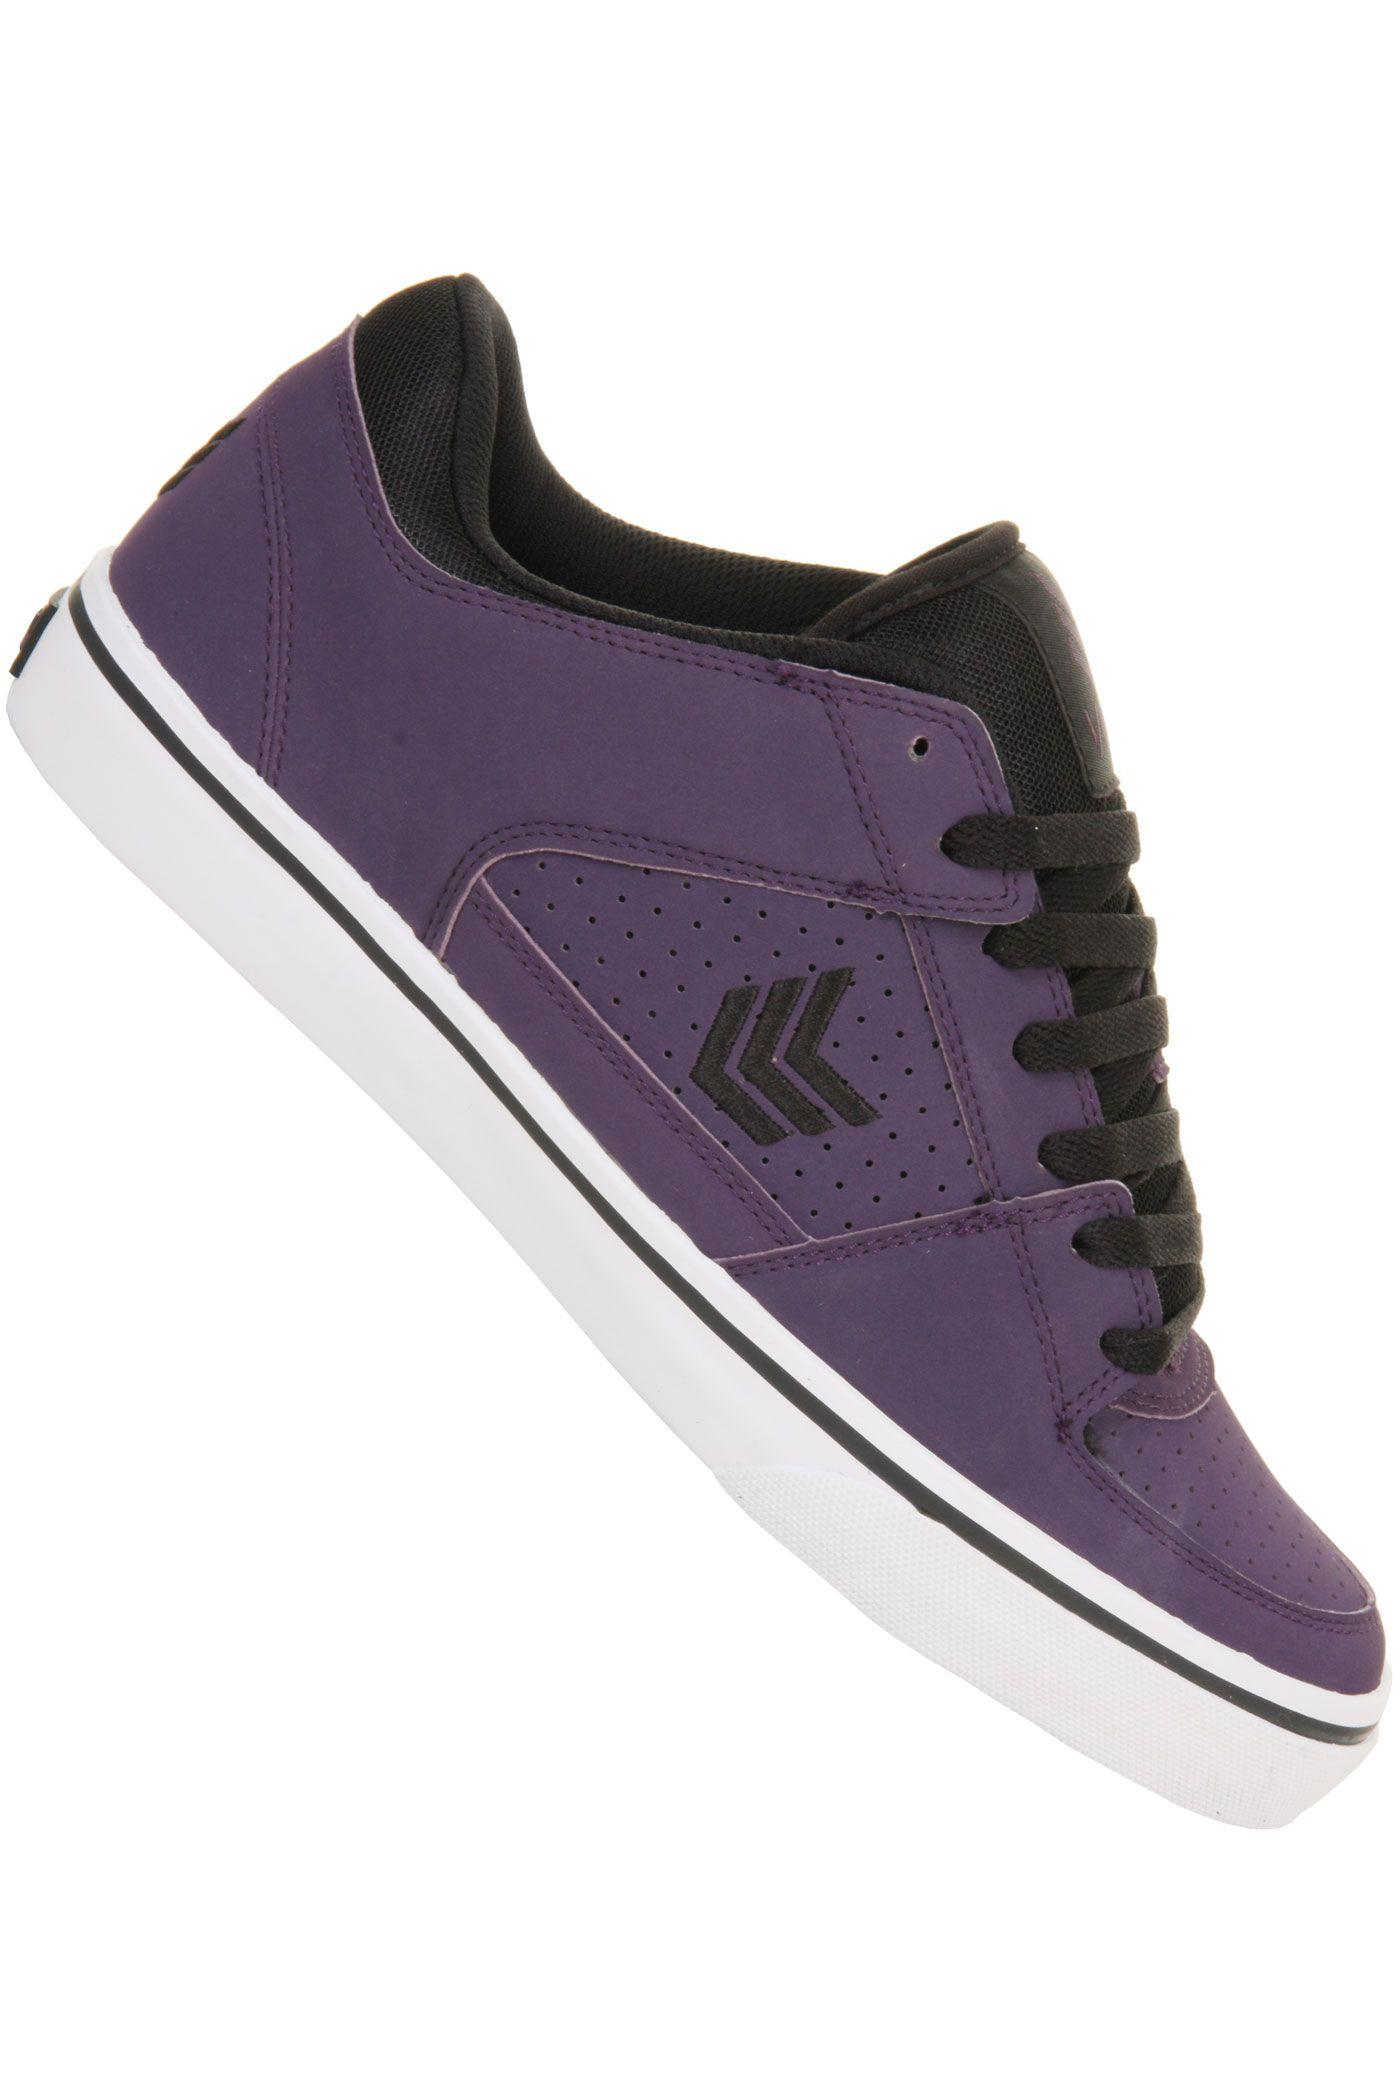 Emerica Skate Shoes Reynolds Purple/White, número de zapato:42